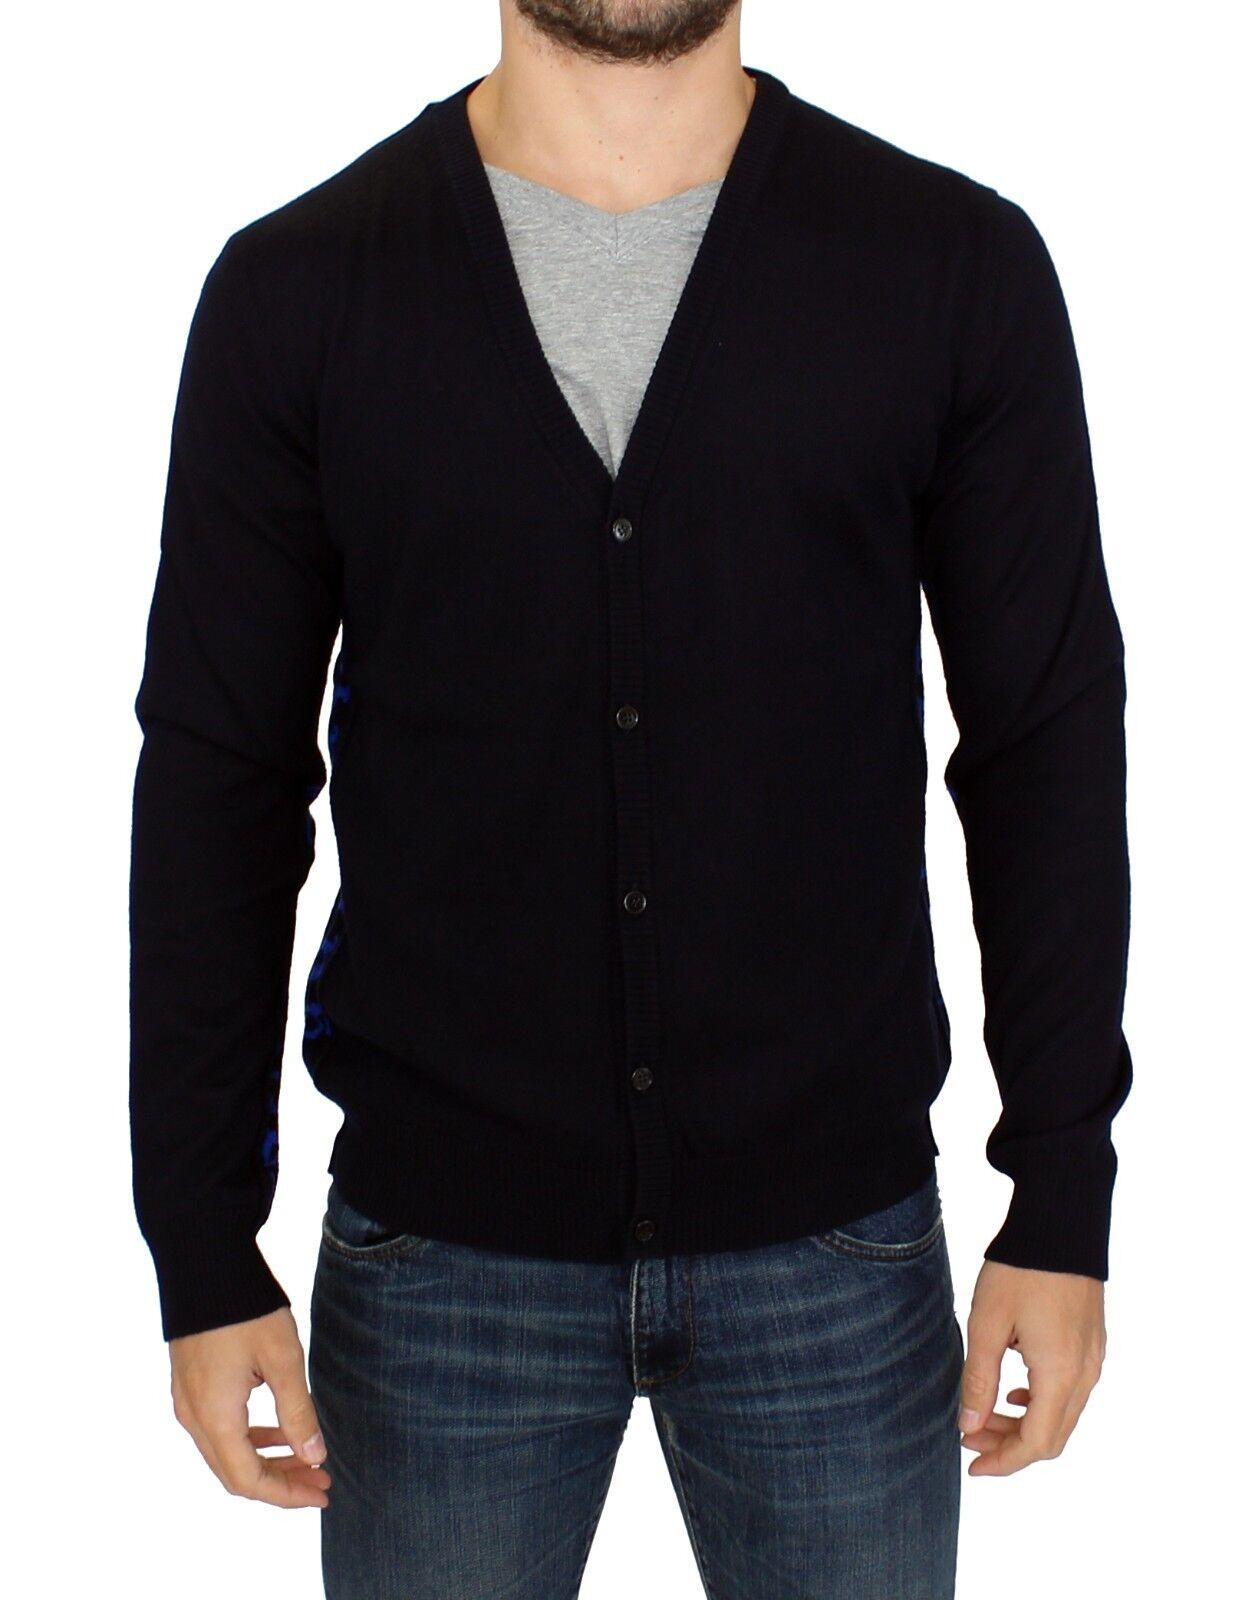 NEW 360 GALLIANO Cardigan Dark Blau Wool Blend Button Down Sweater Top s. XL